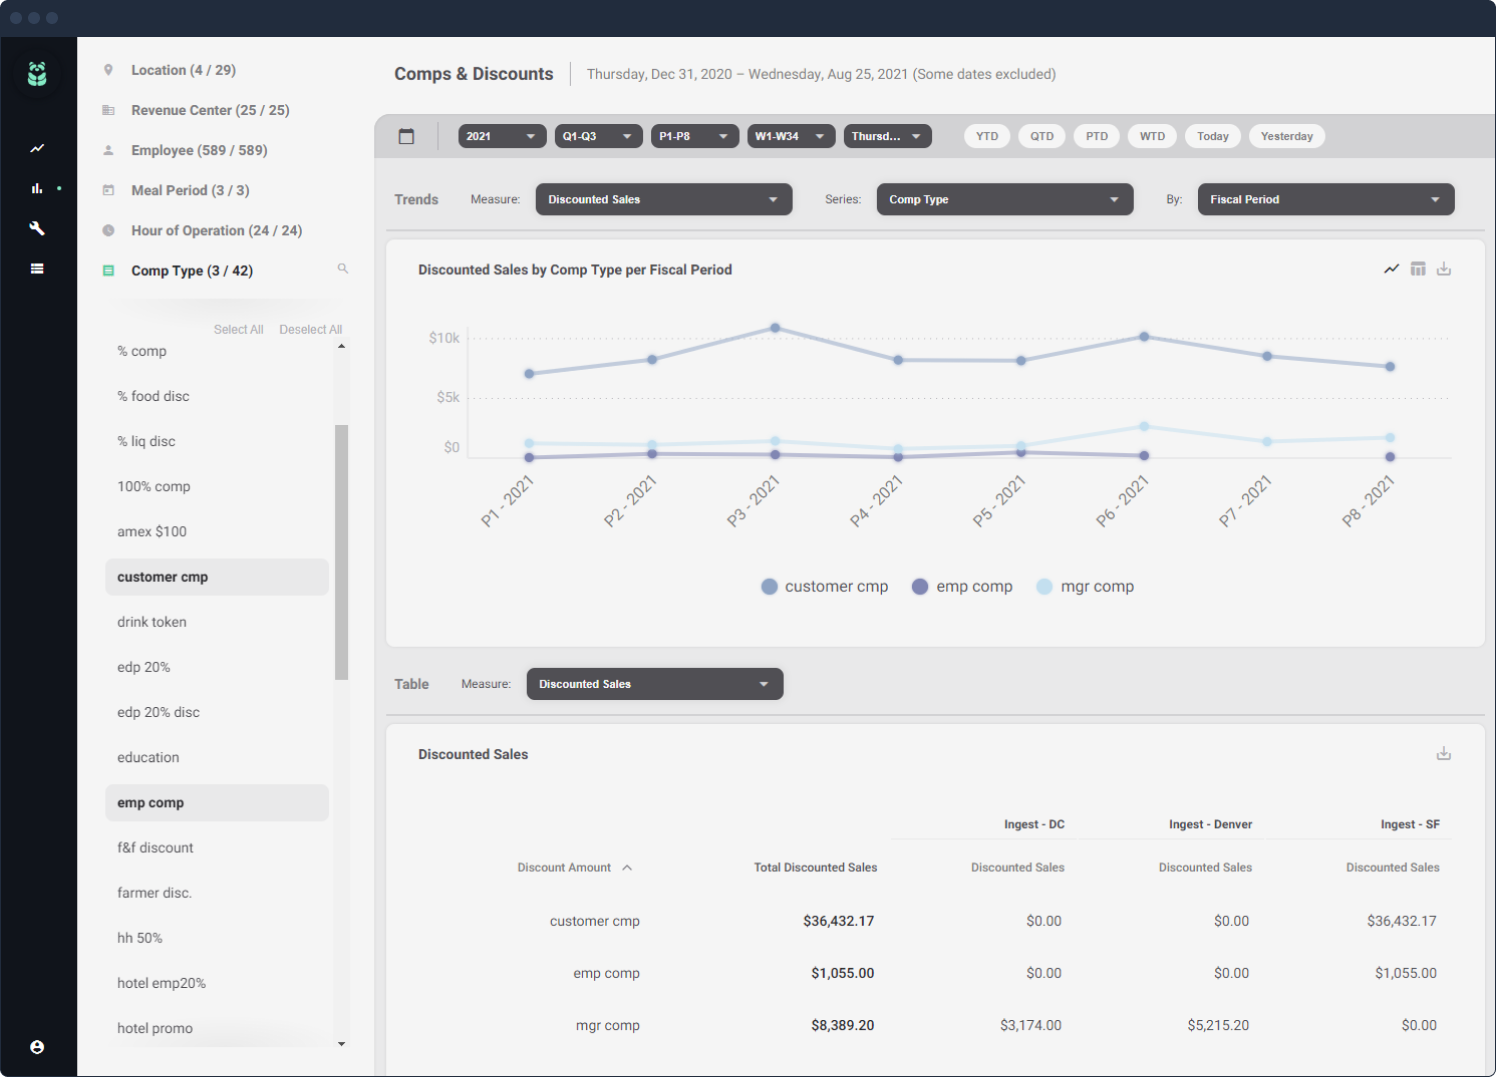 Comps & Discounts dashboard screenshot